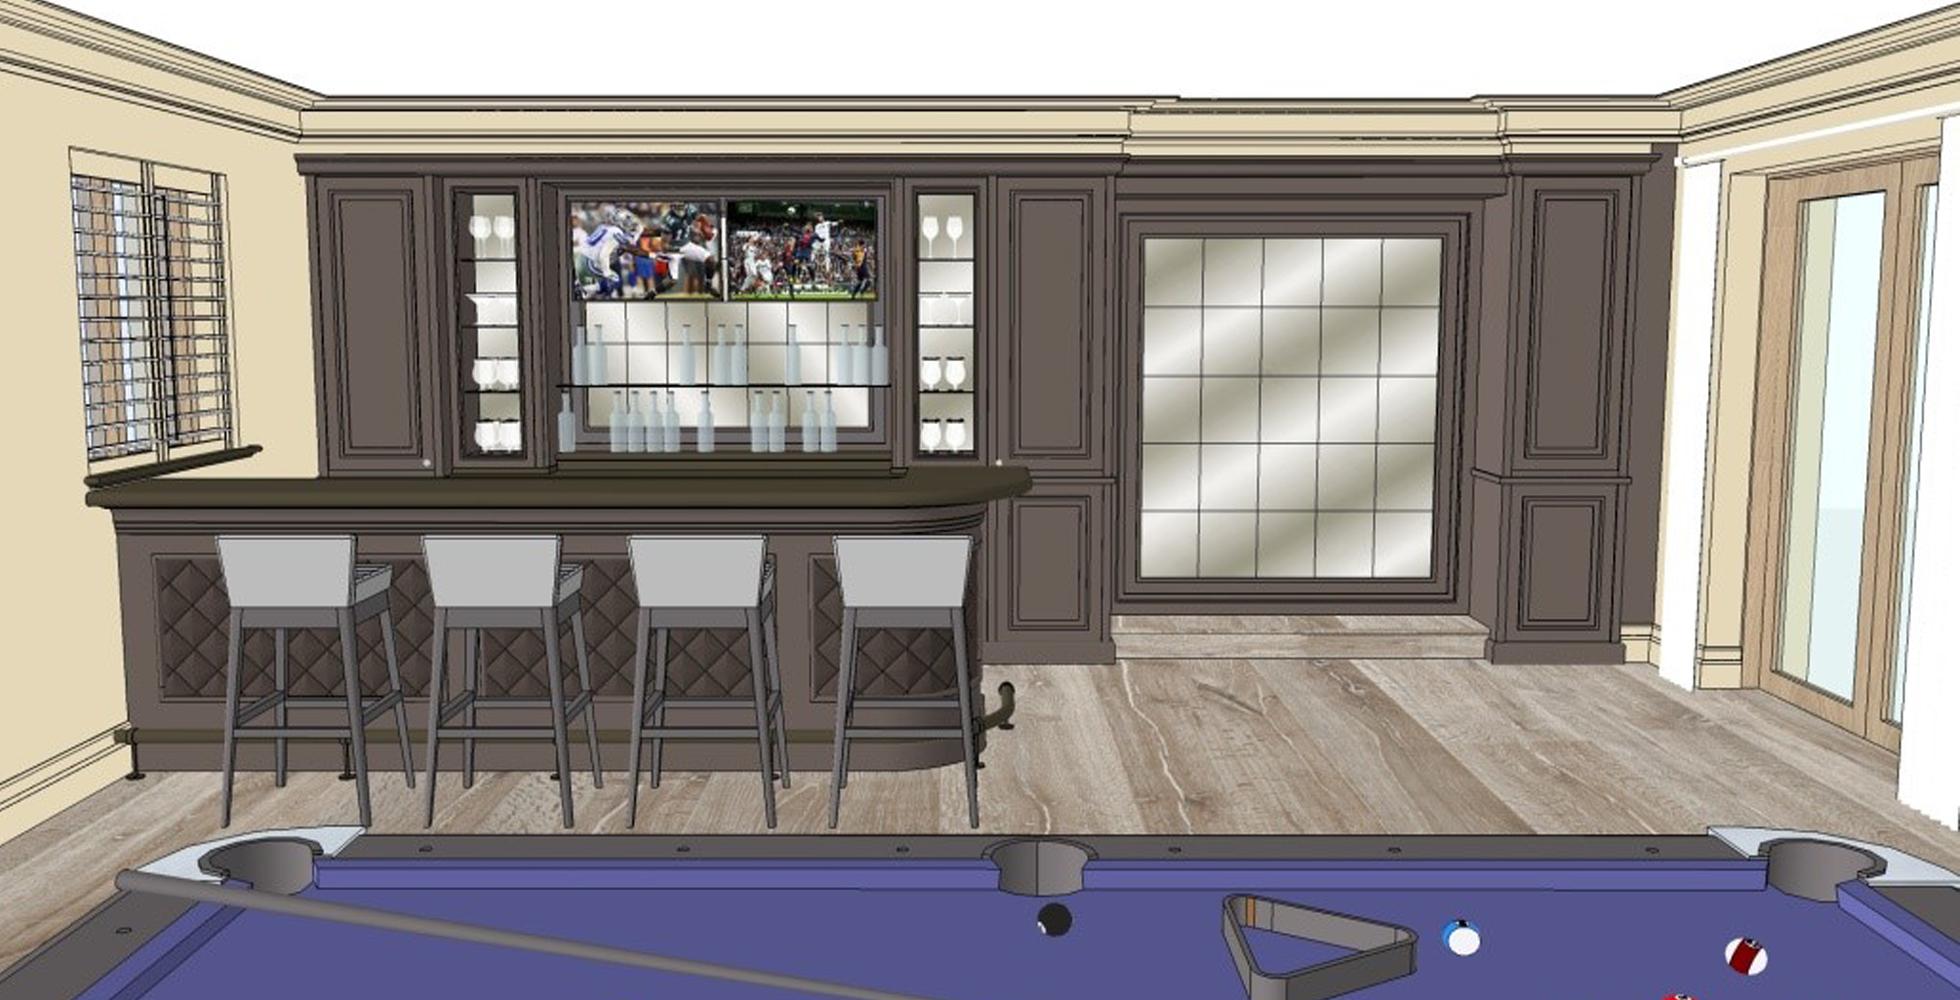 Sketch up image of bespoke bar